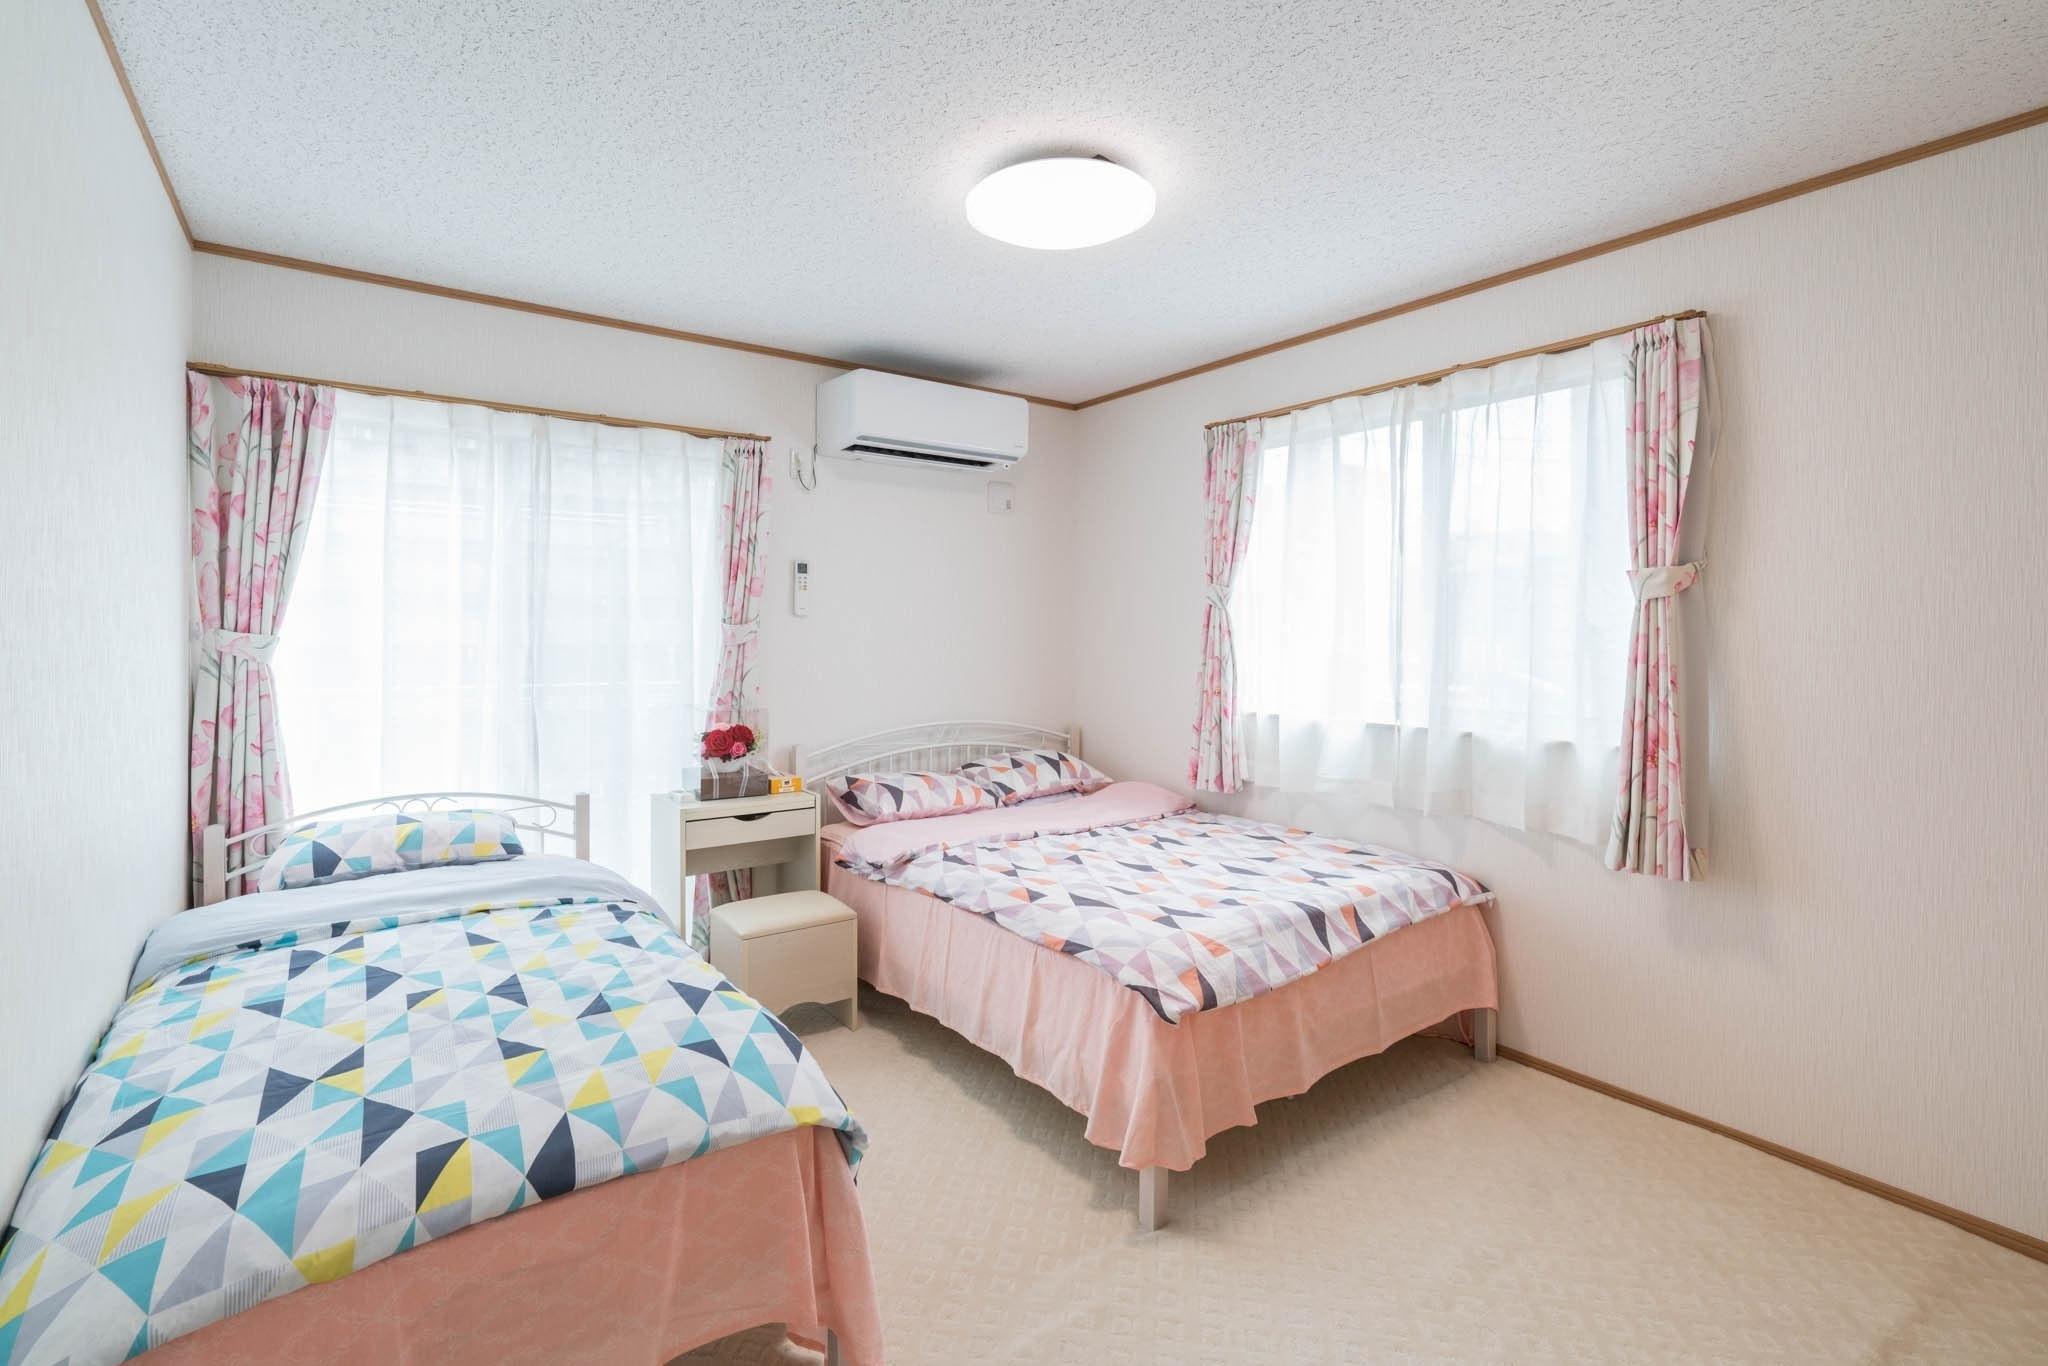 203号室ツインルーム/新築高級住宅/JR線徒歩2分/無料高速Wi-Fi/池袋17分新宿27分